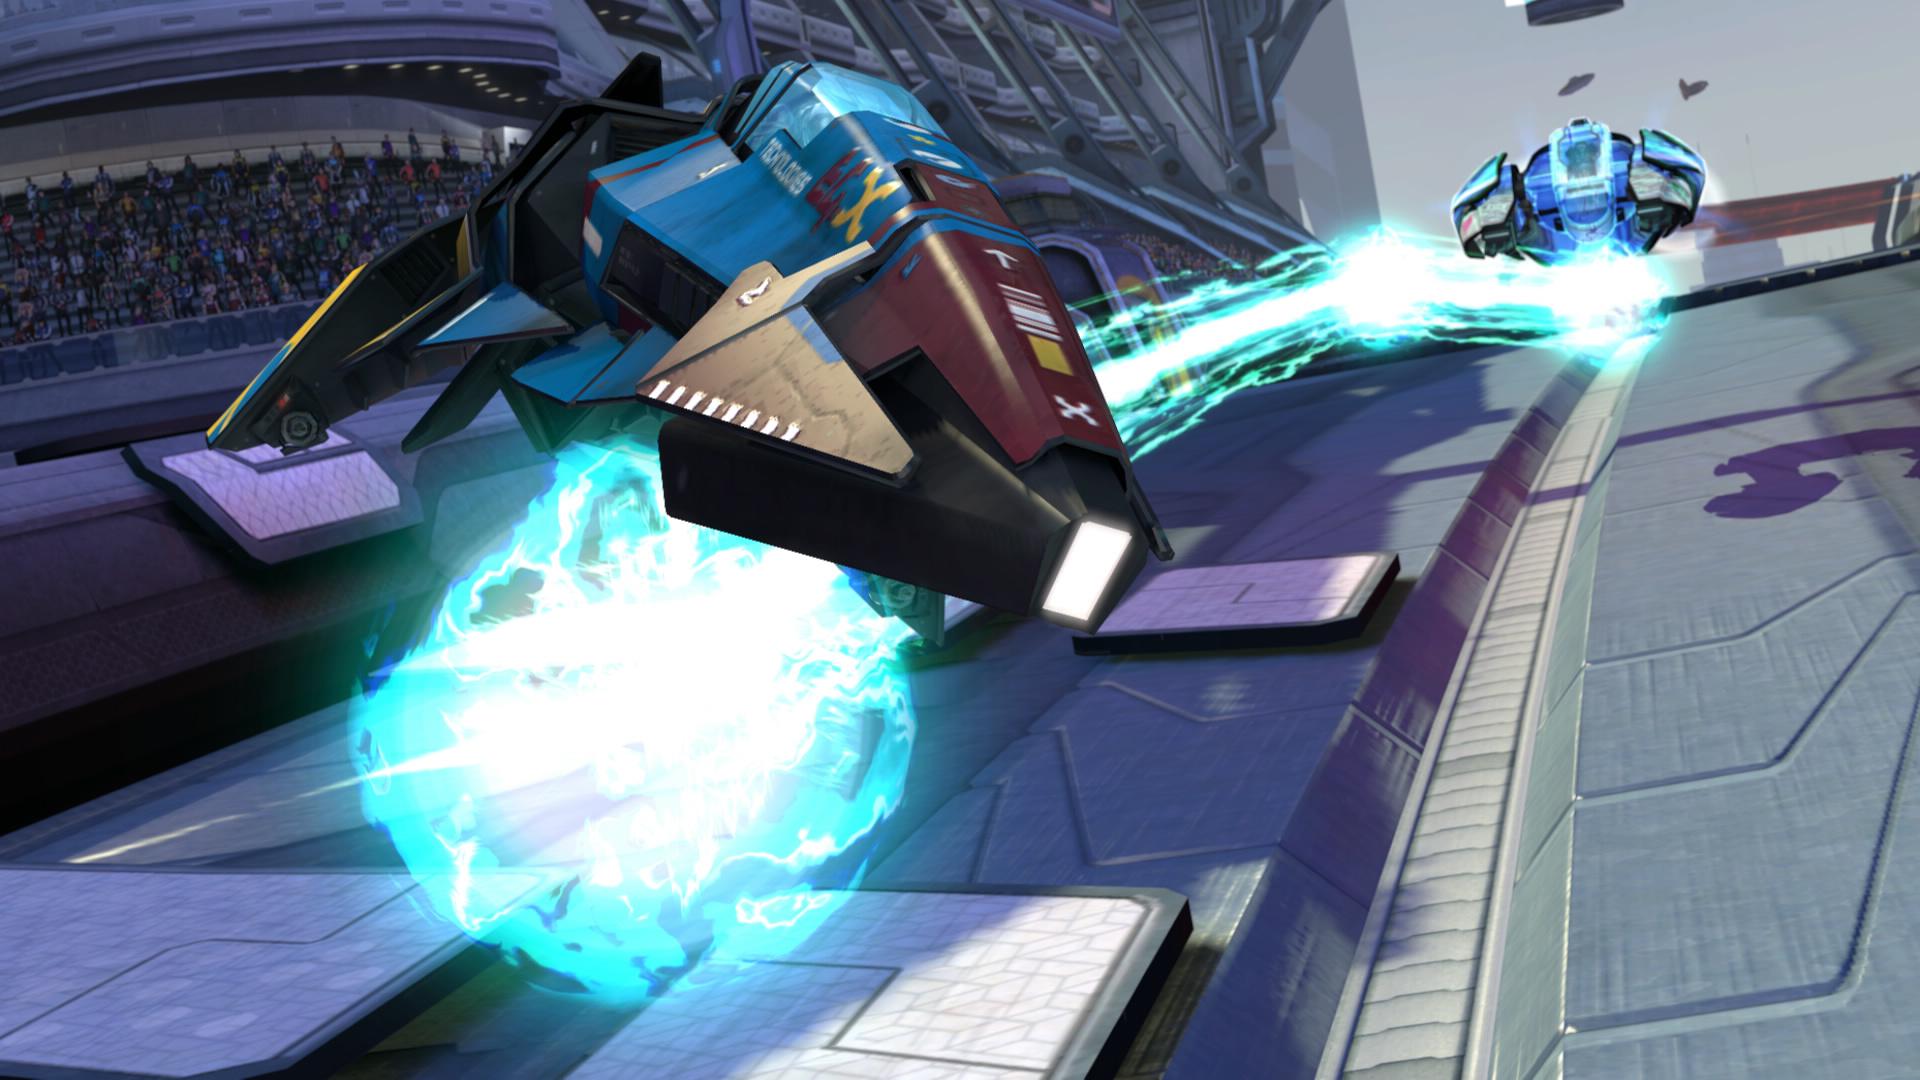 1d0746b15792 Leech Beam. Leech Beam Playstation All Stars Wiki Fandom Powered By Wikia. Reebok  X Beam Franchise Steve Francis Basketball Shoe 2002